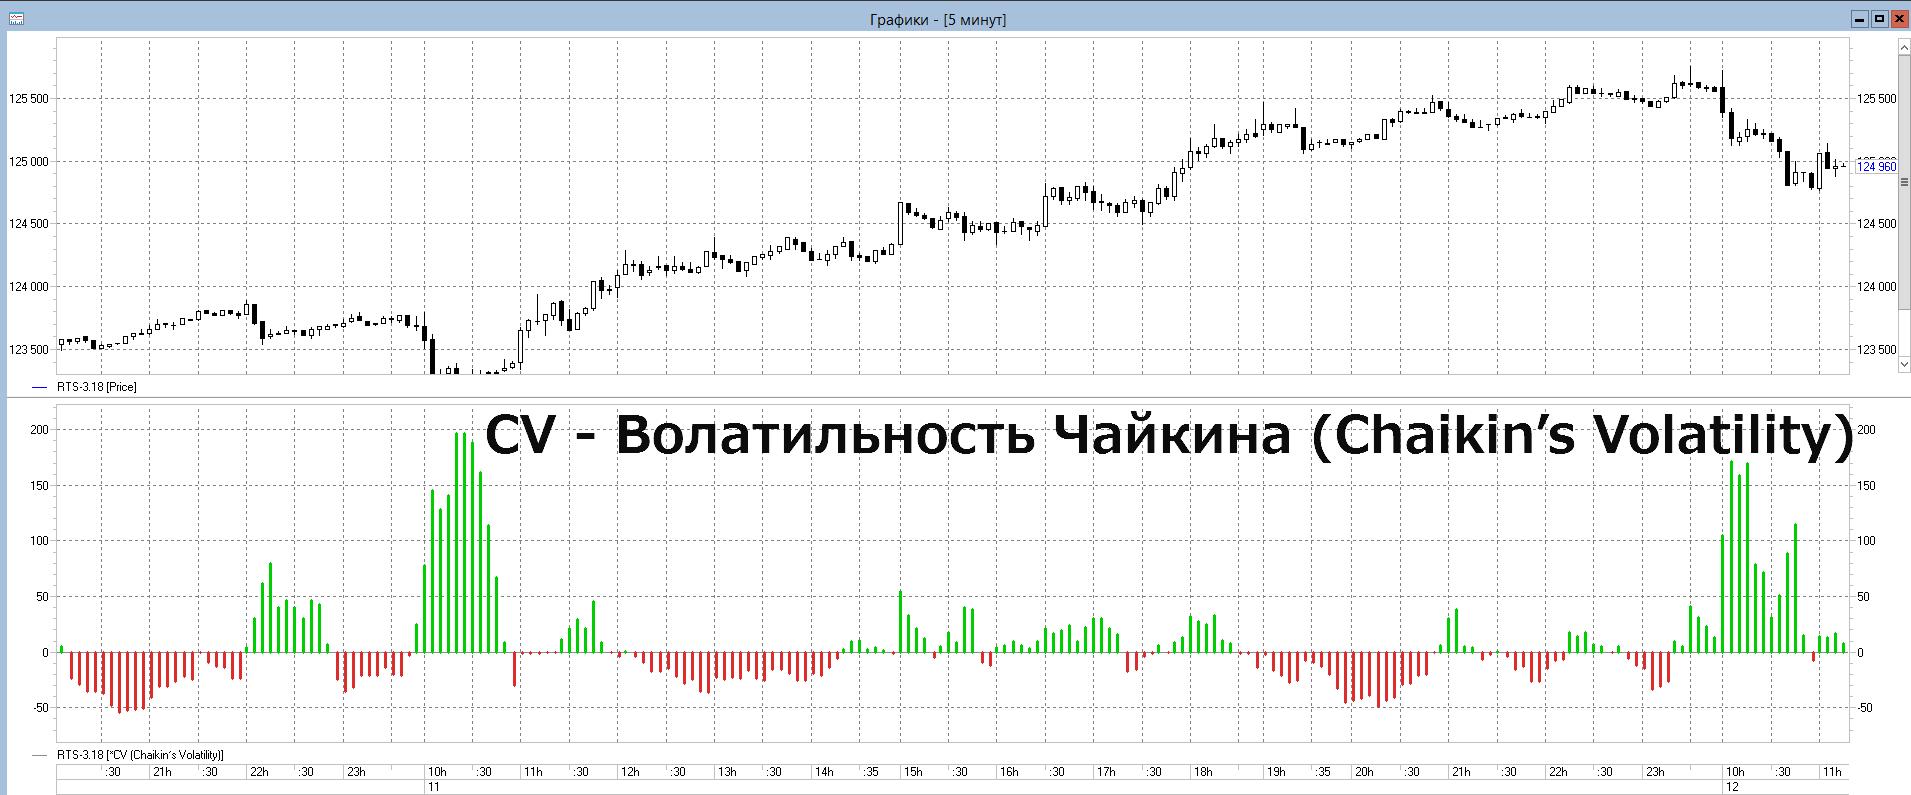 Chaikins-Volatility